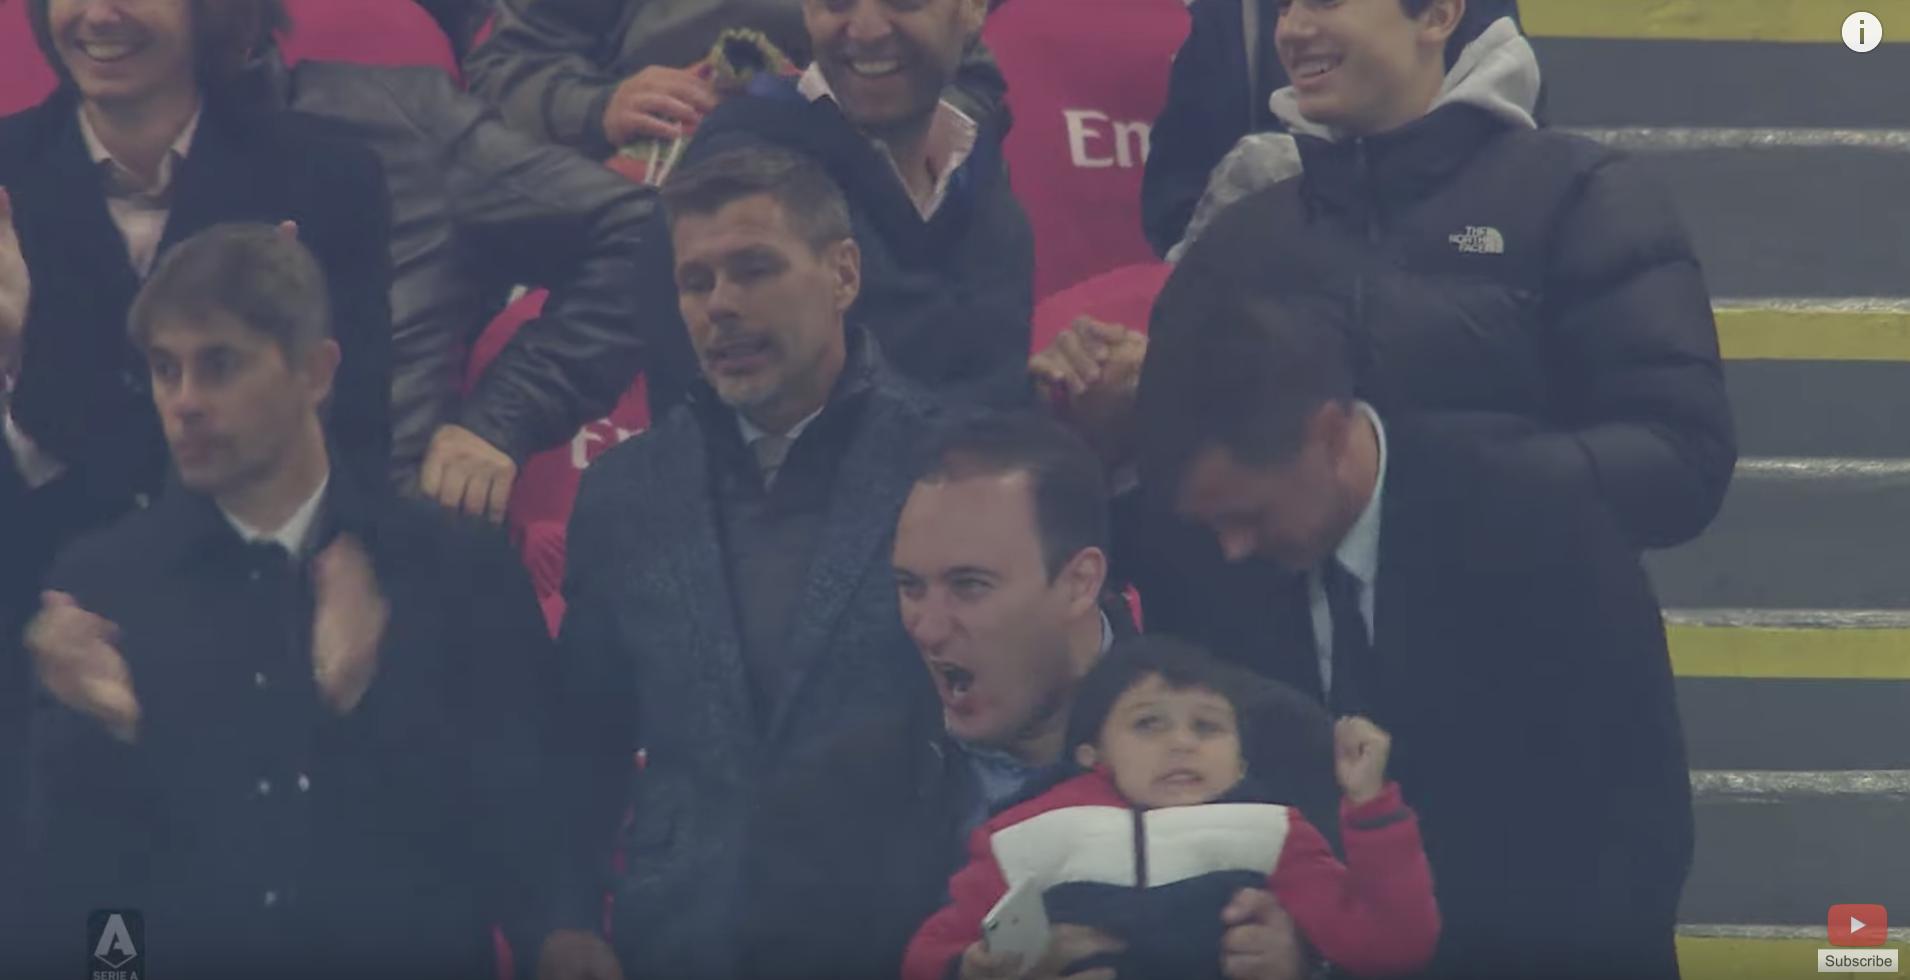 WATCH: Sports Secretary Clifton Grima Celebrates Milan Goal Of Maldini